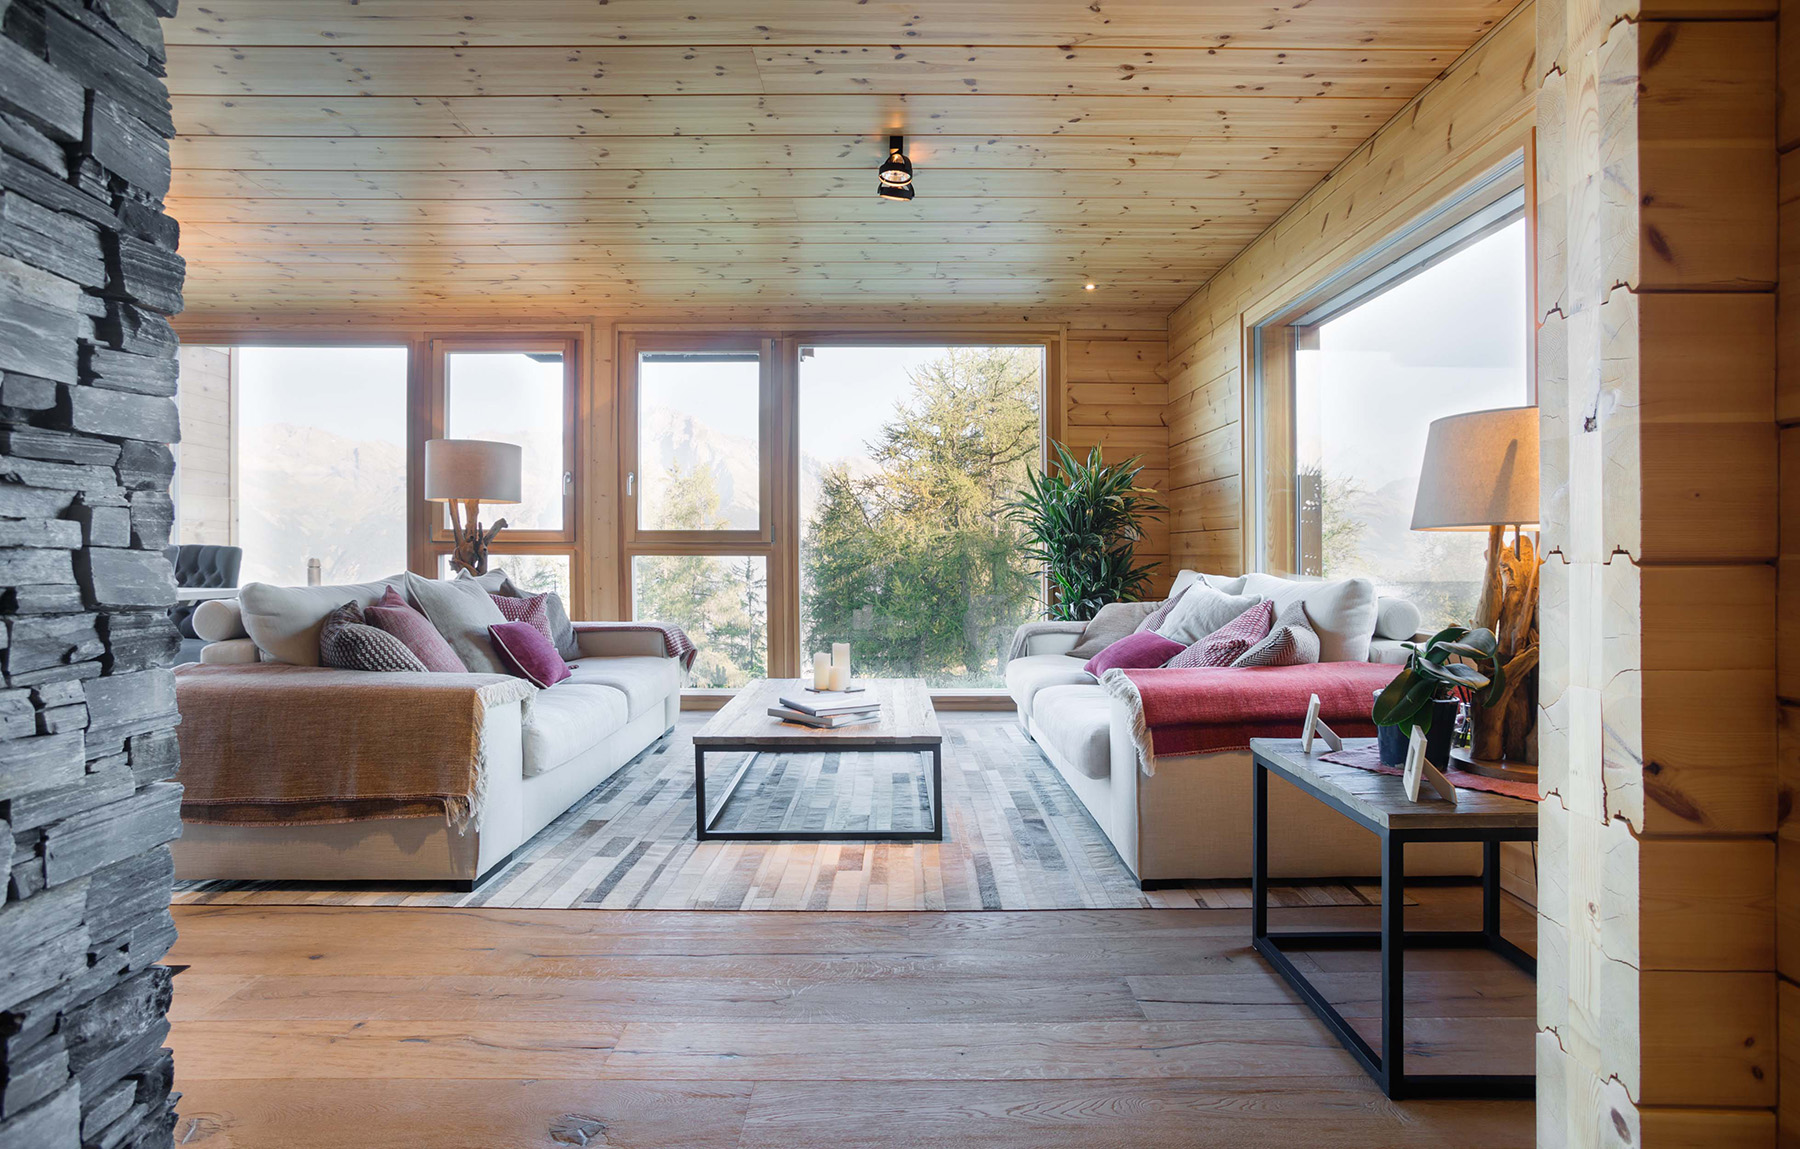 construire ma maison bois massif ma maison bois. Black Bedroom Furniture Sets. Home Design Ideas